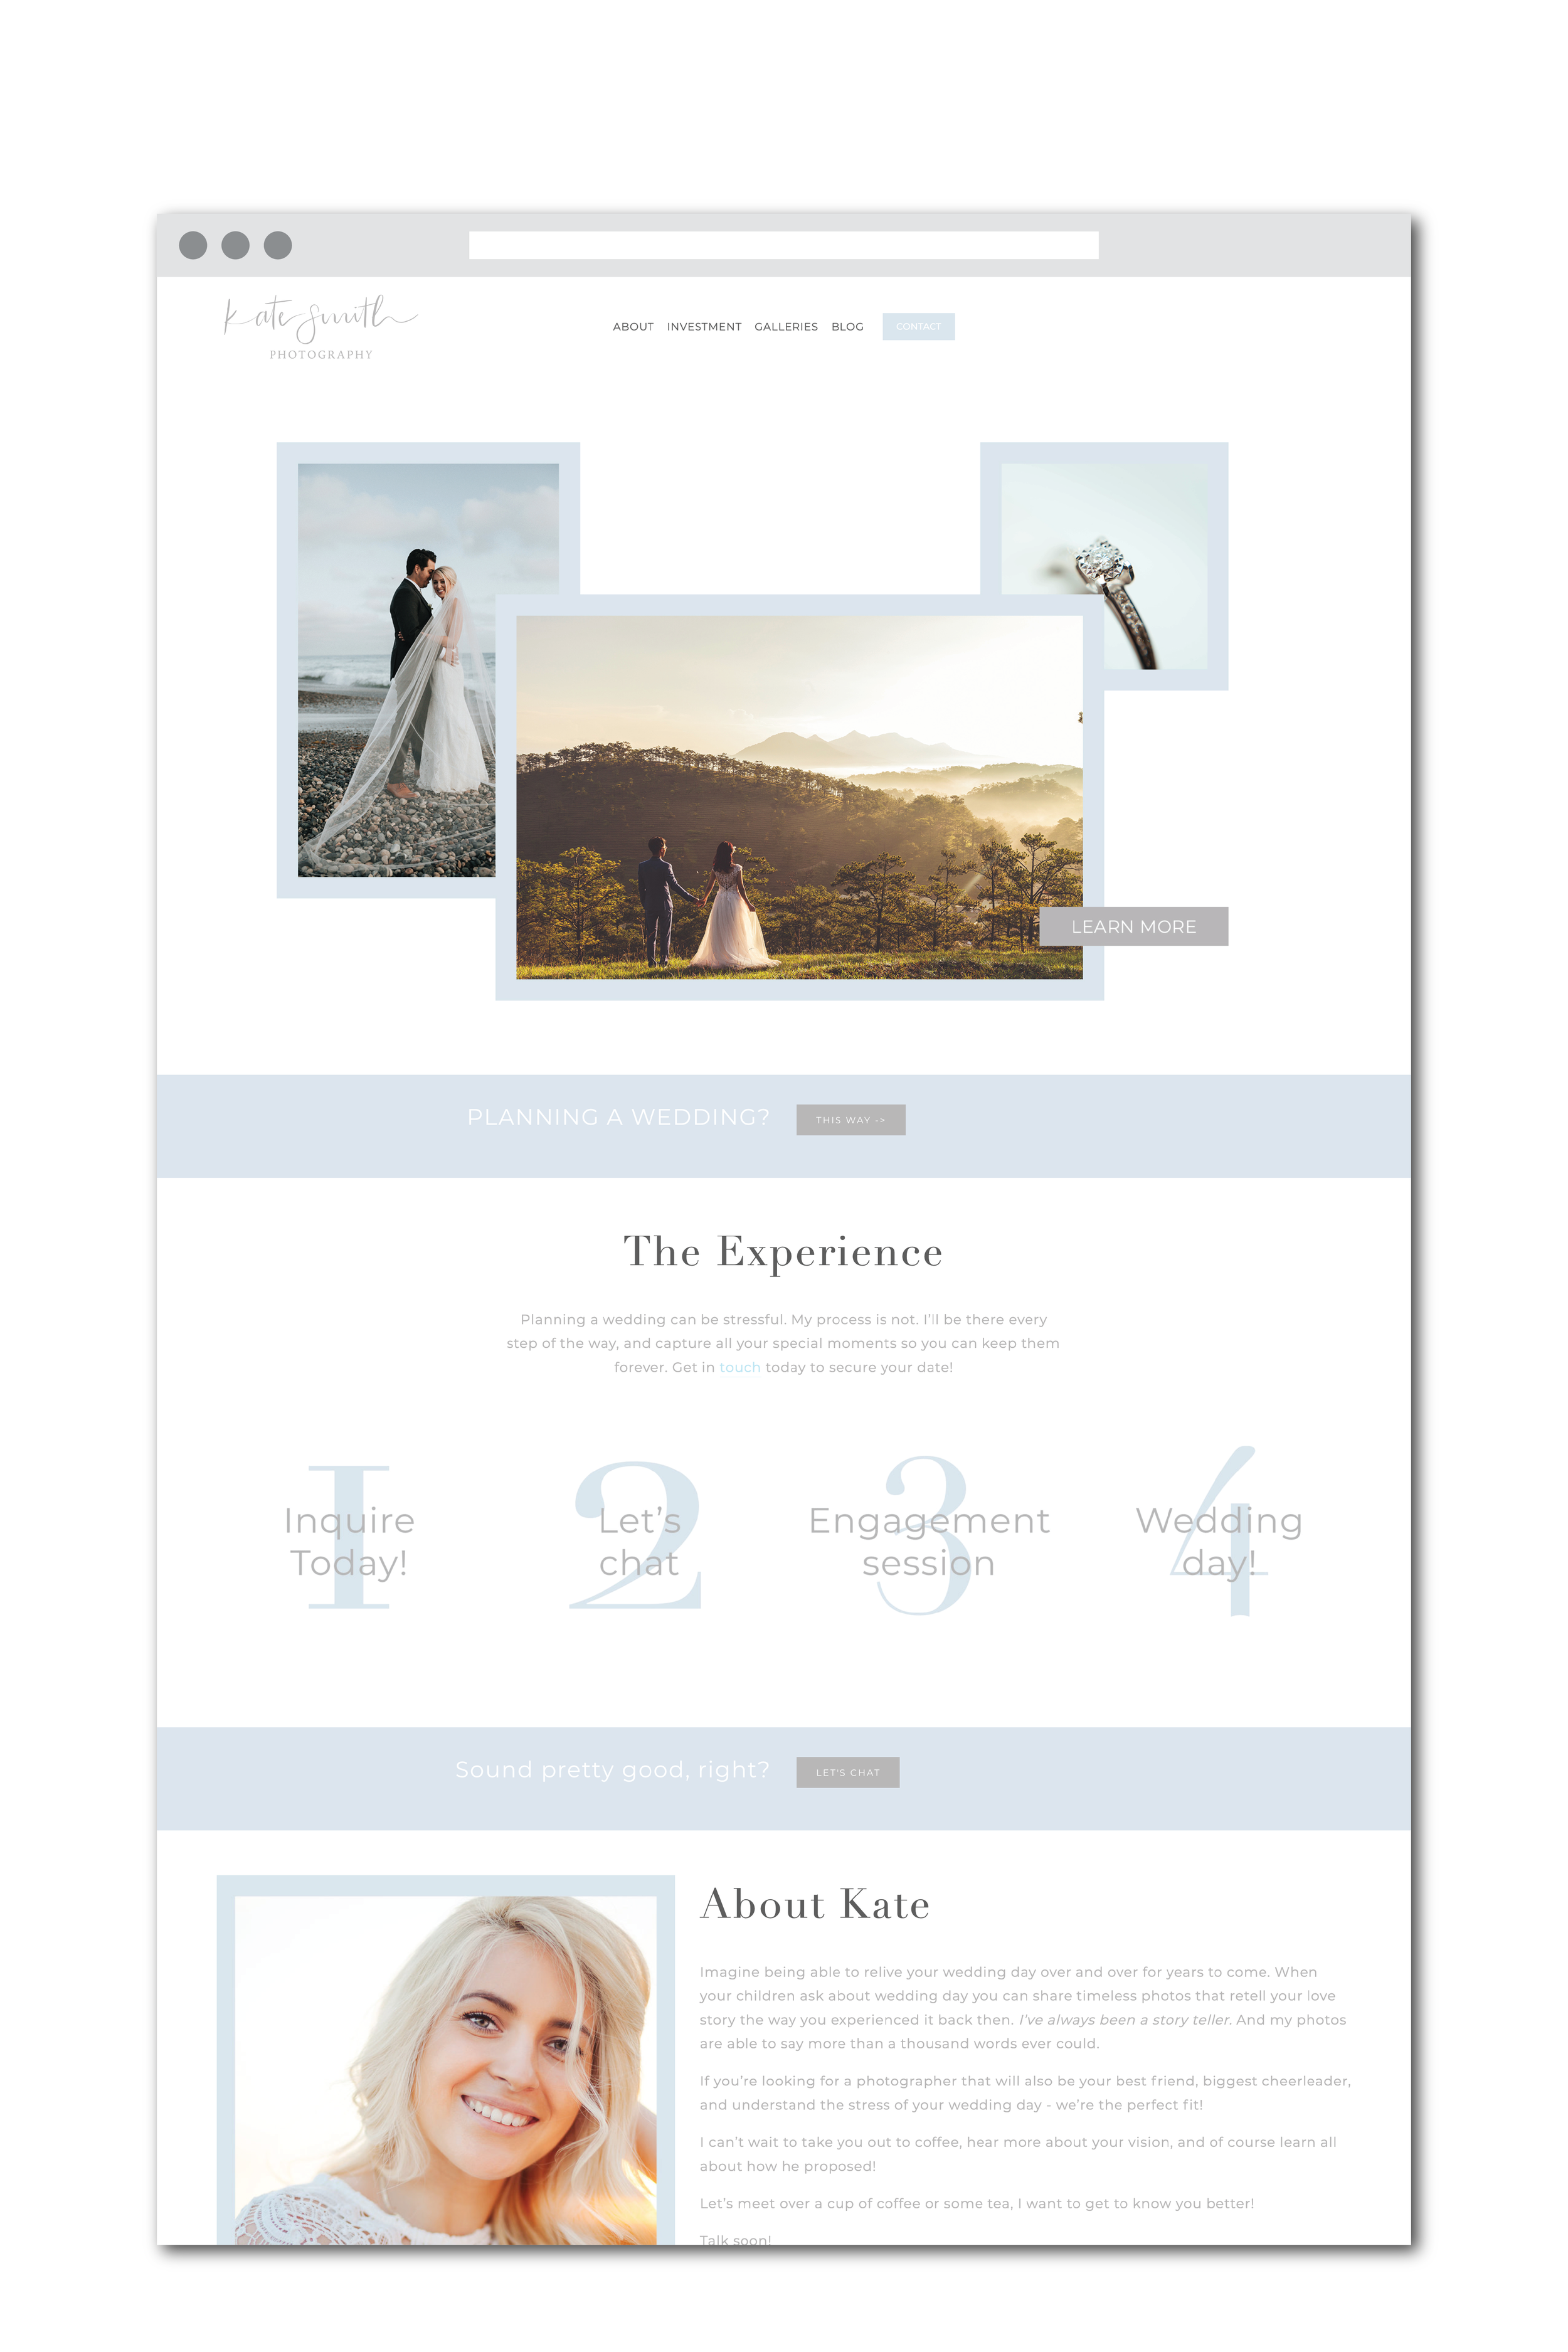 Kate Smith website